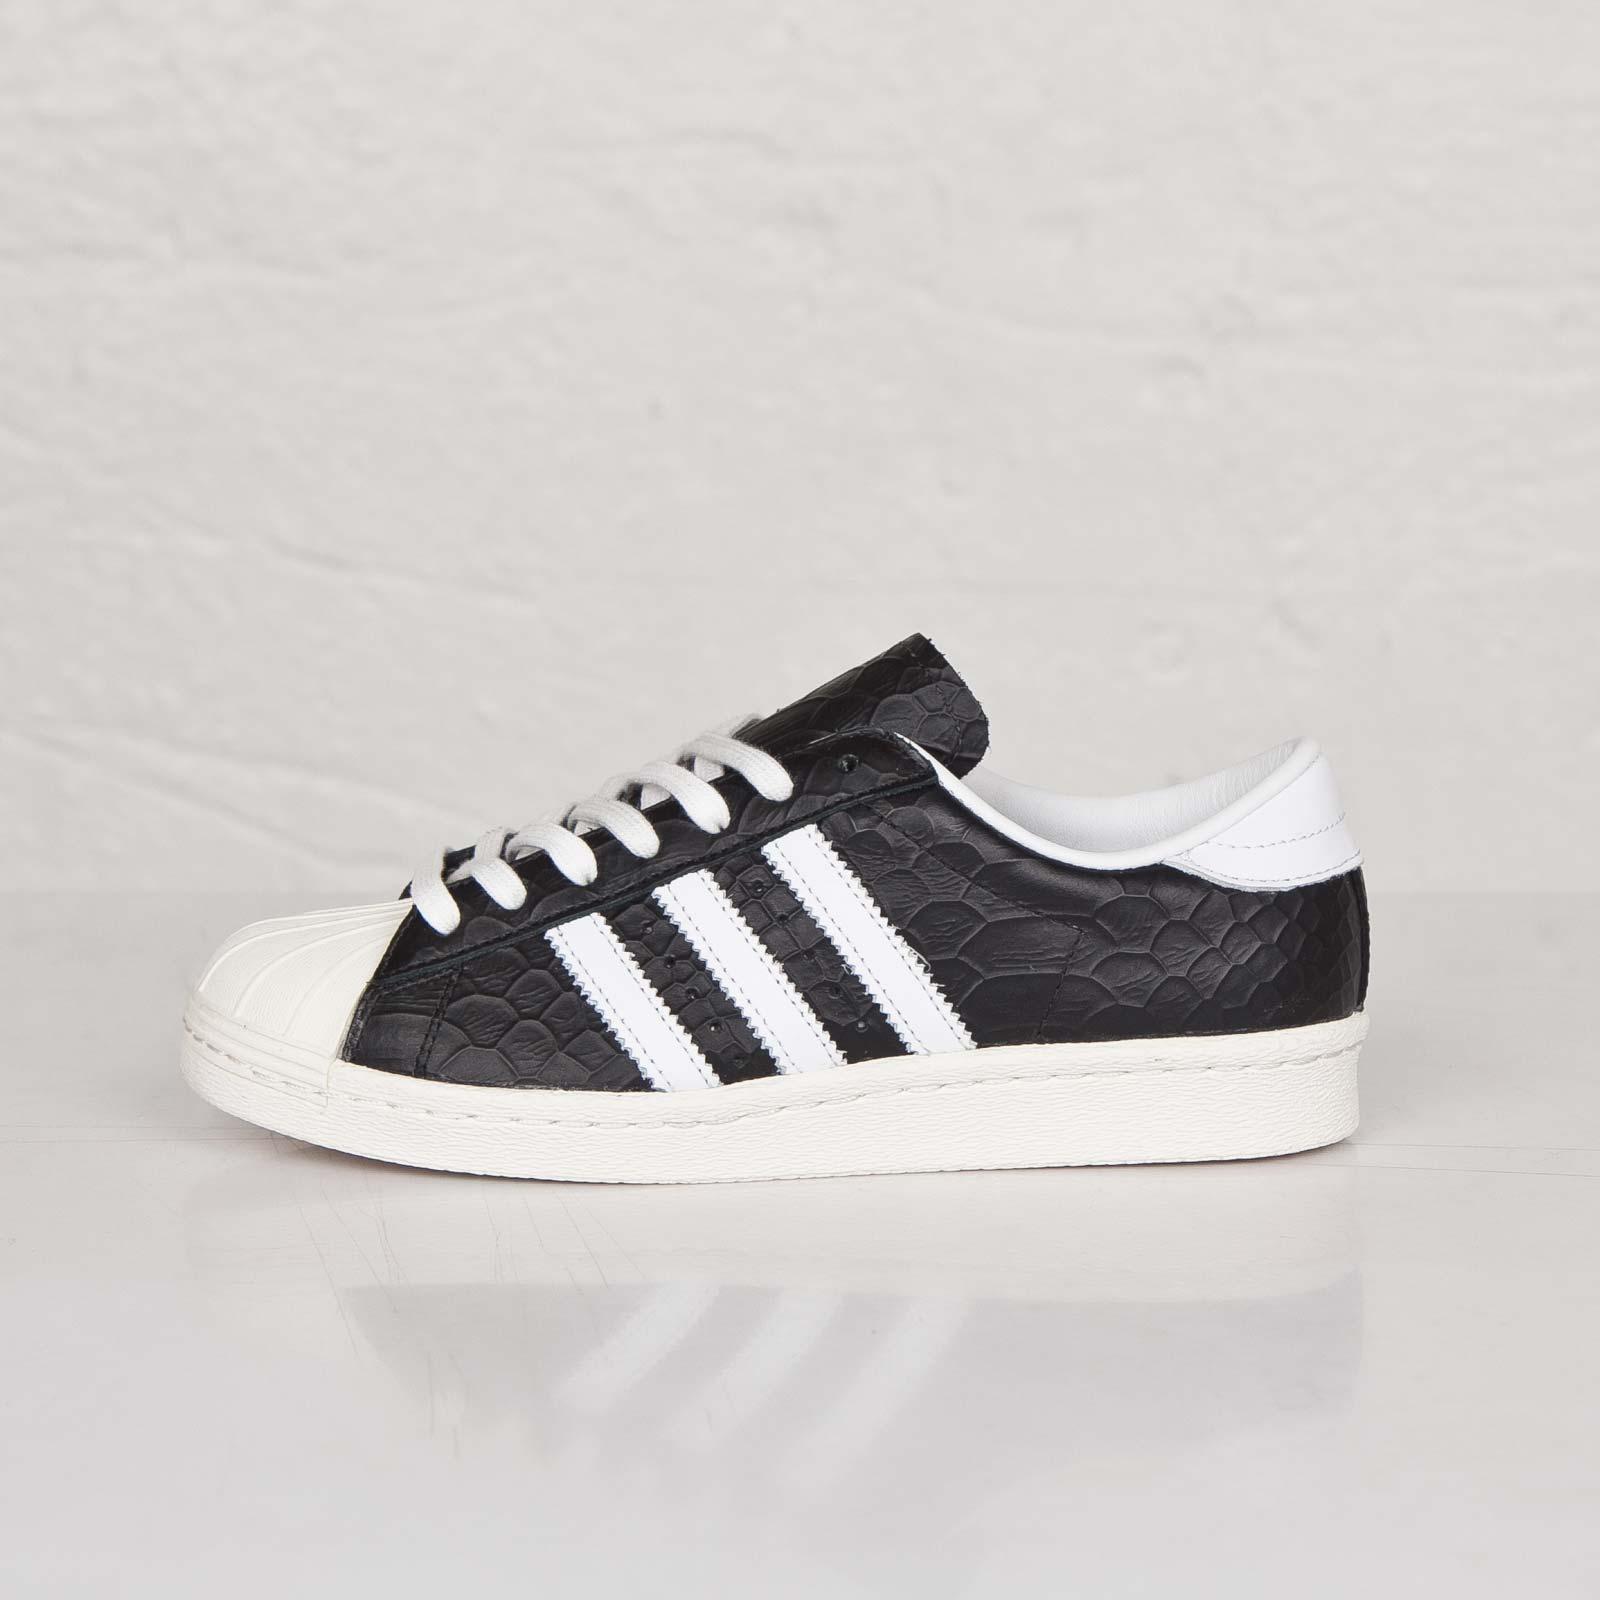 Zapatillas adidas adidas adidas superstar 80 HYKE b35757 sneakersnstuff 9fa27d